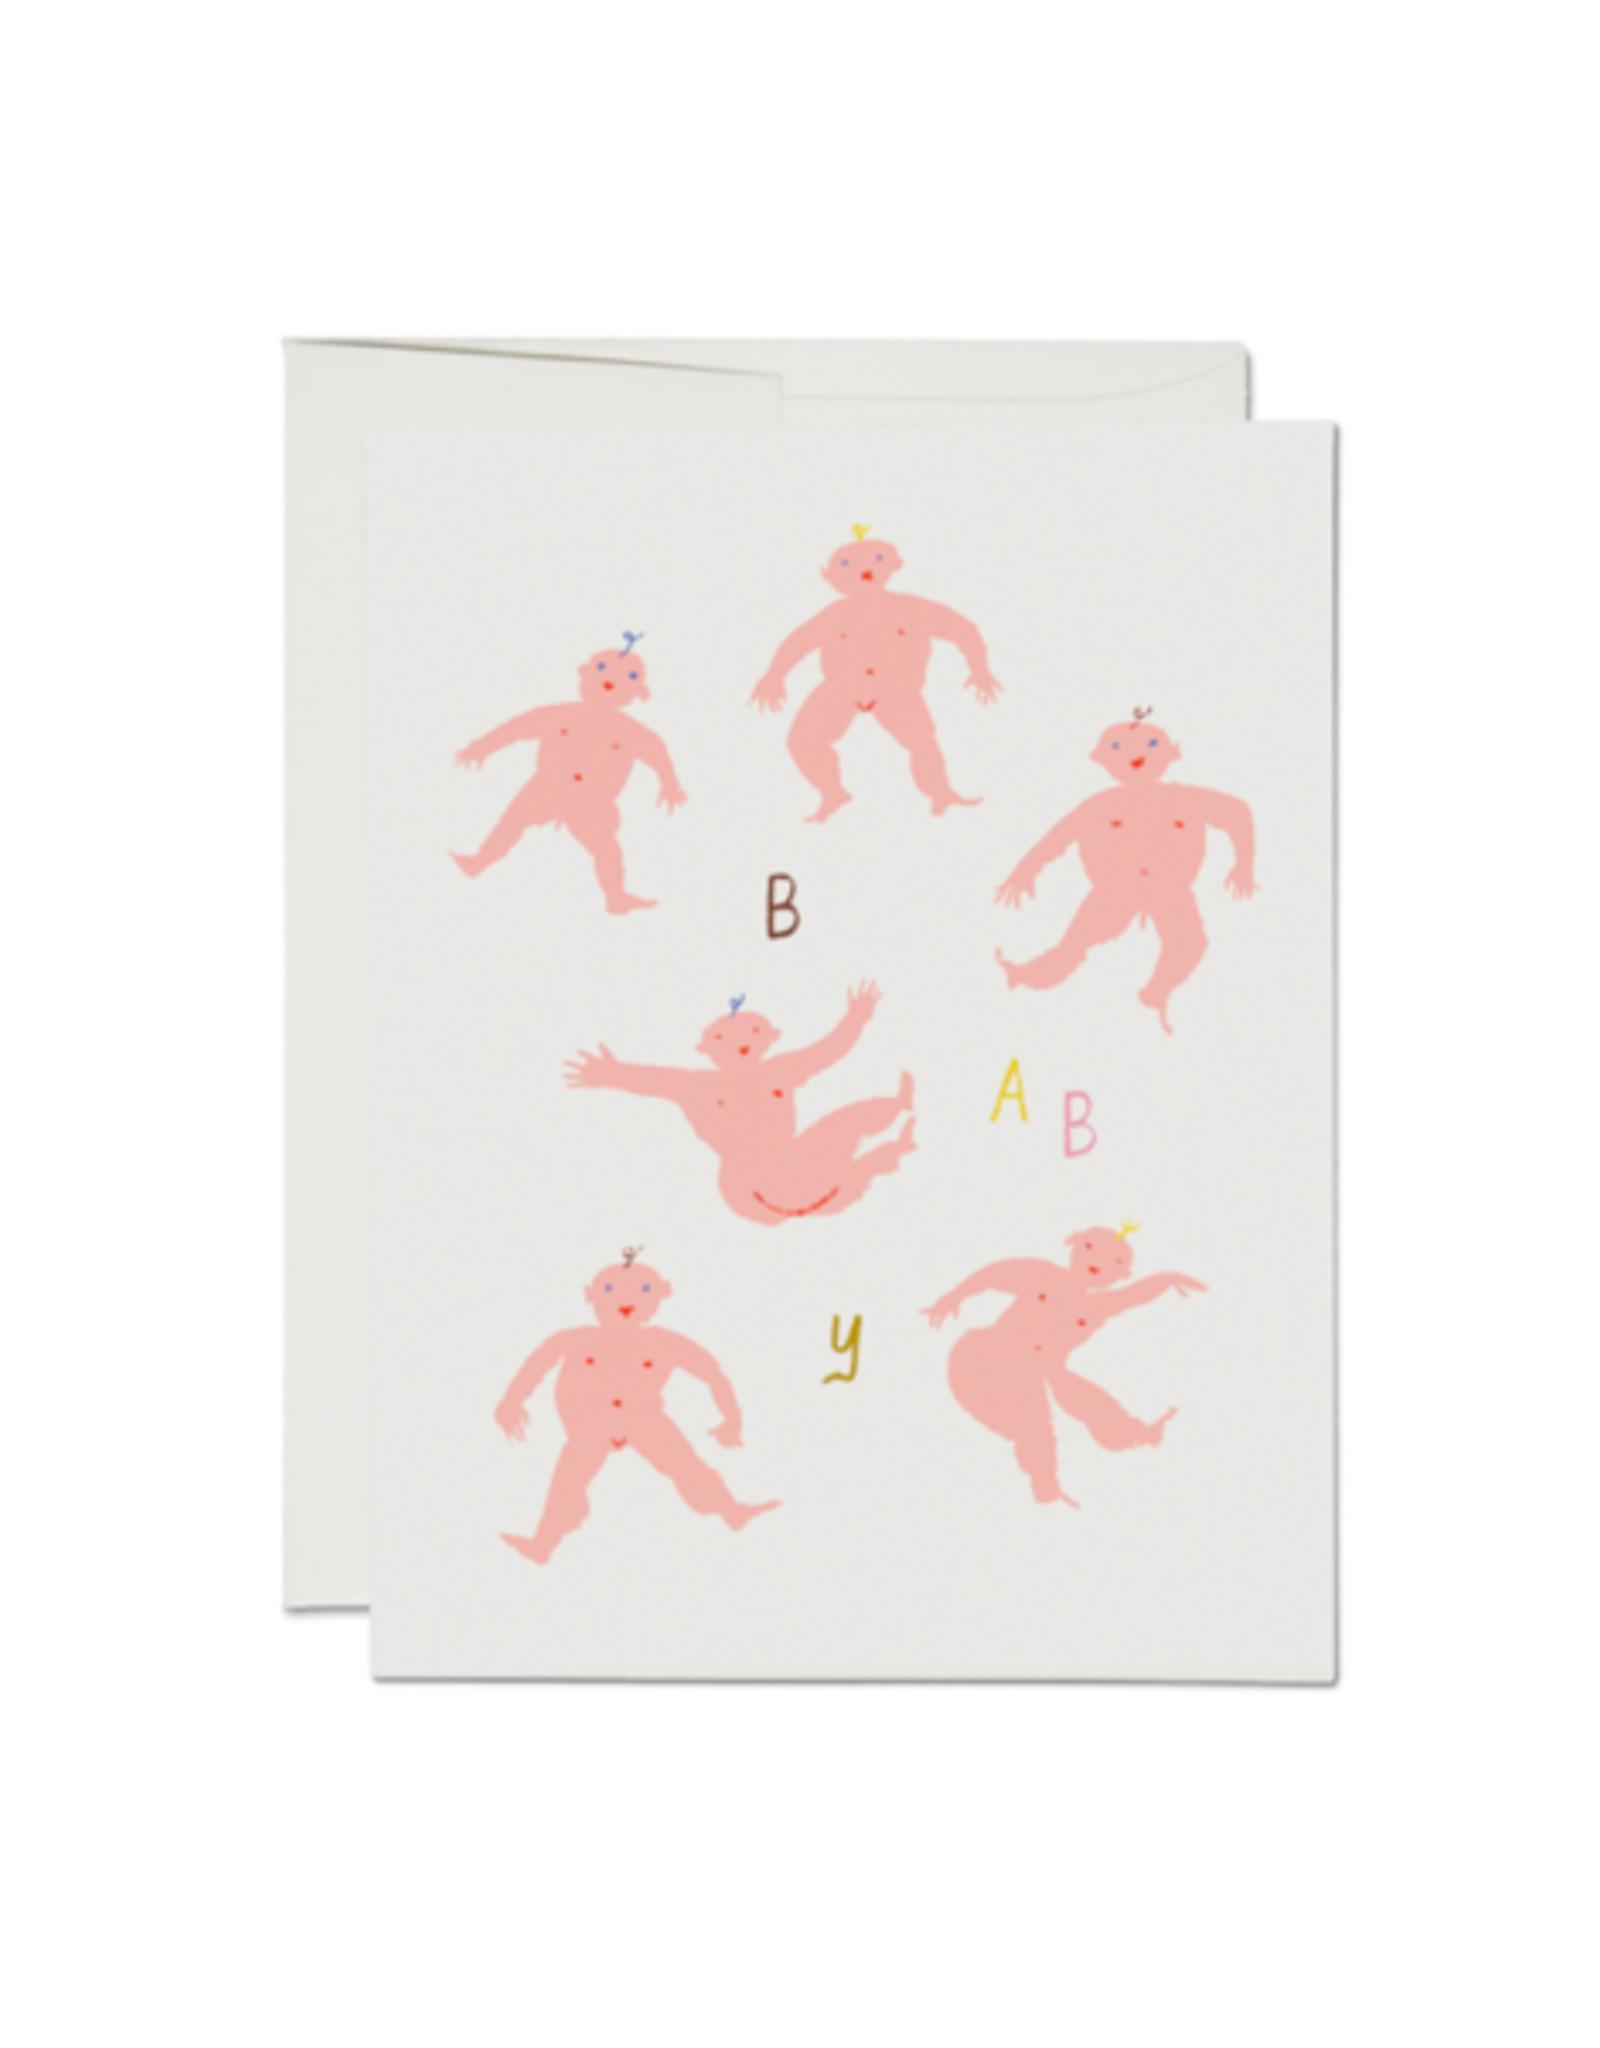 "RAP - Card/Little Humans, 4.25 x 5.5"""